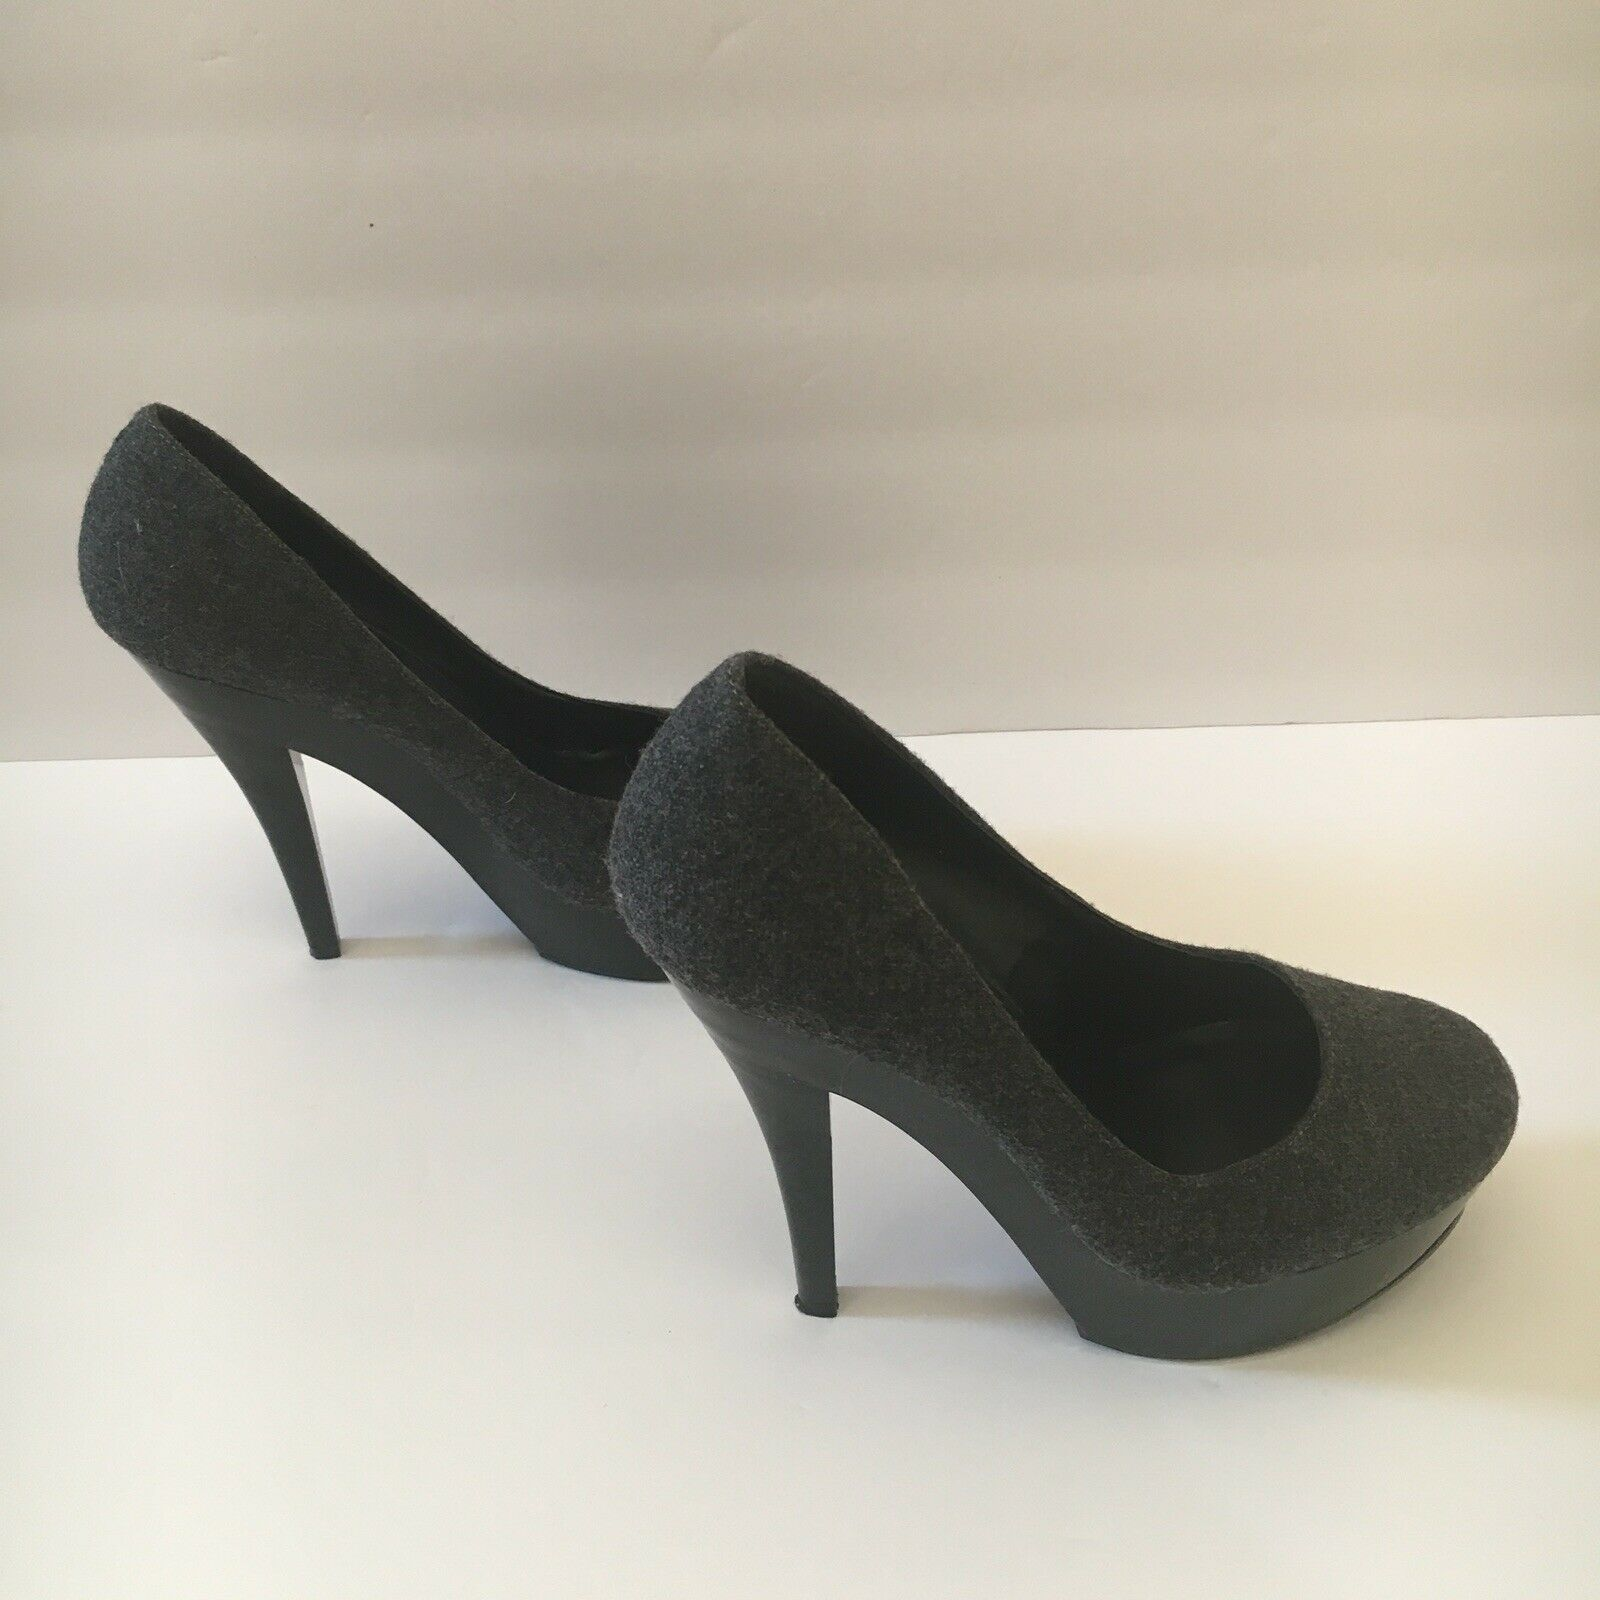 Jessica Simpson Gracex Gray Wool Round Toe Platform Pumps Heels Size 7.5 M  image 4